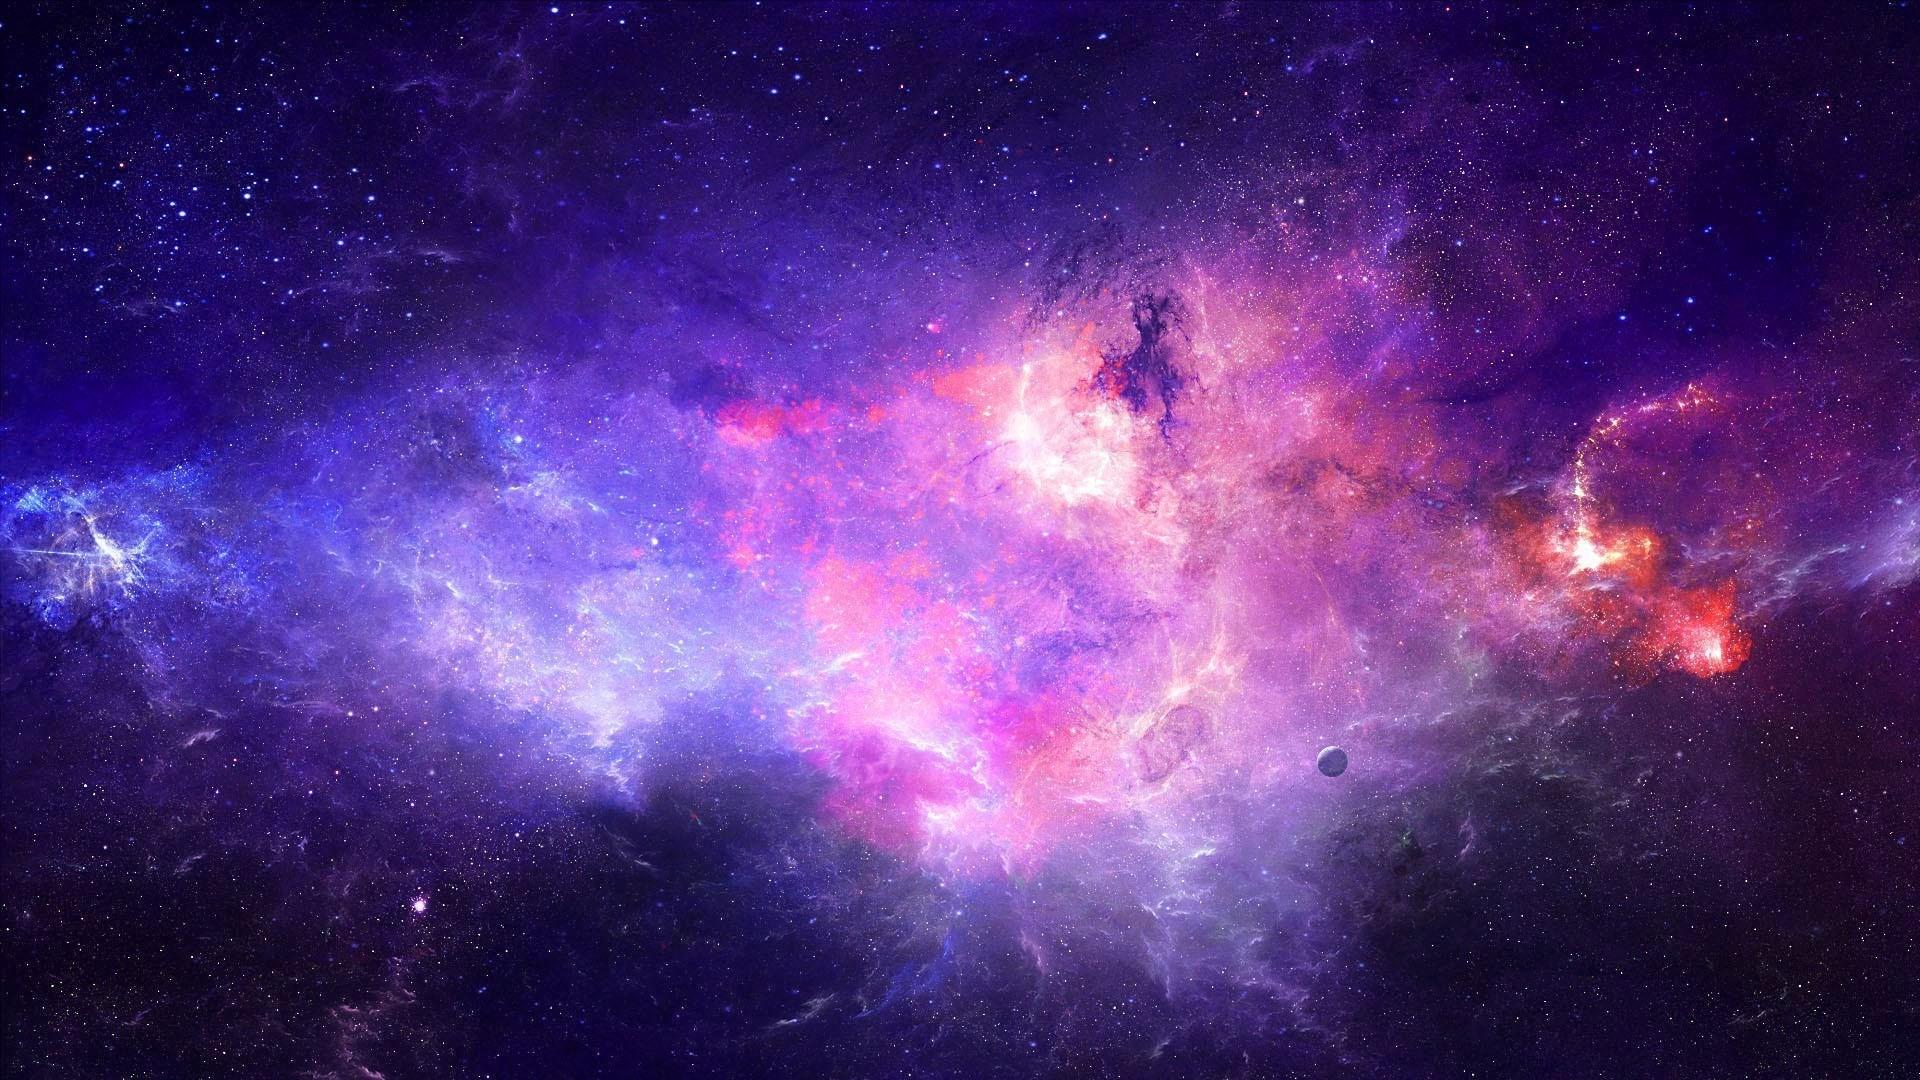 1920x1080px space hd wallpaper by Nita Round